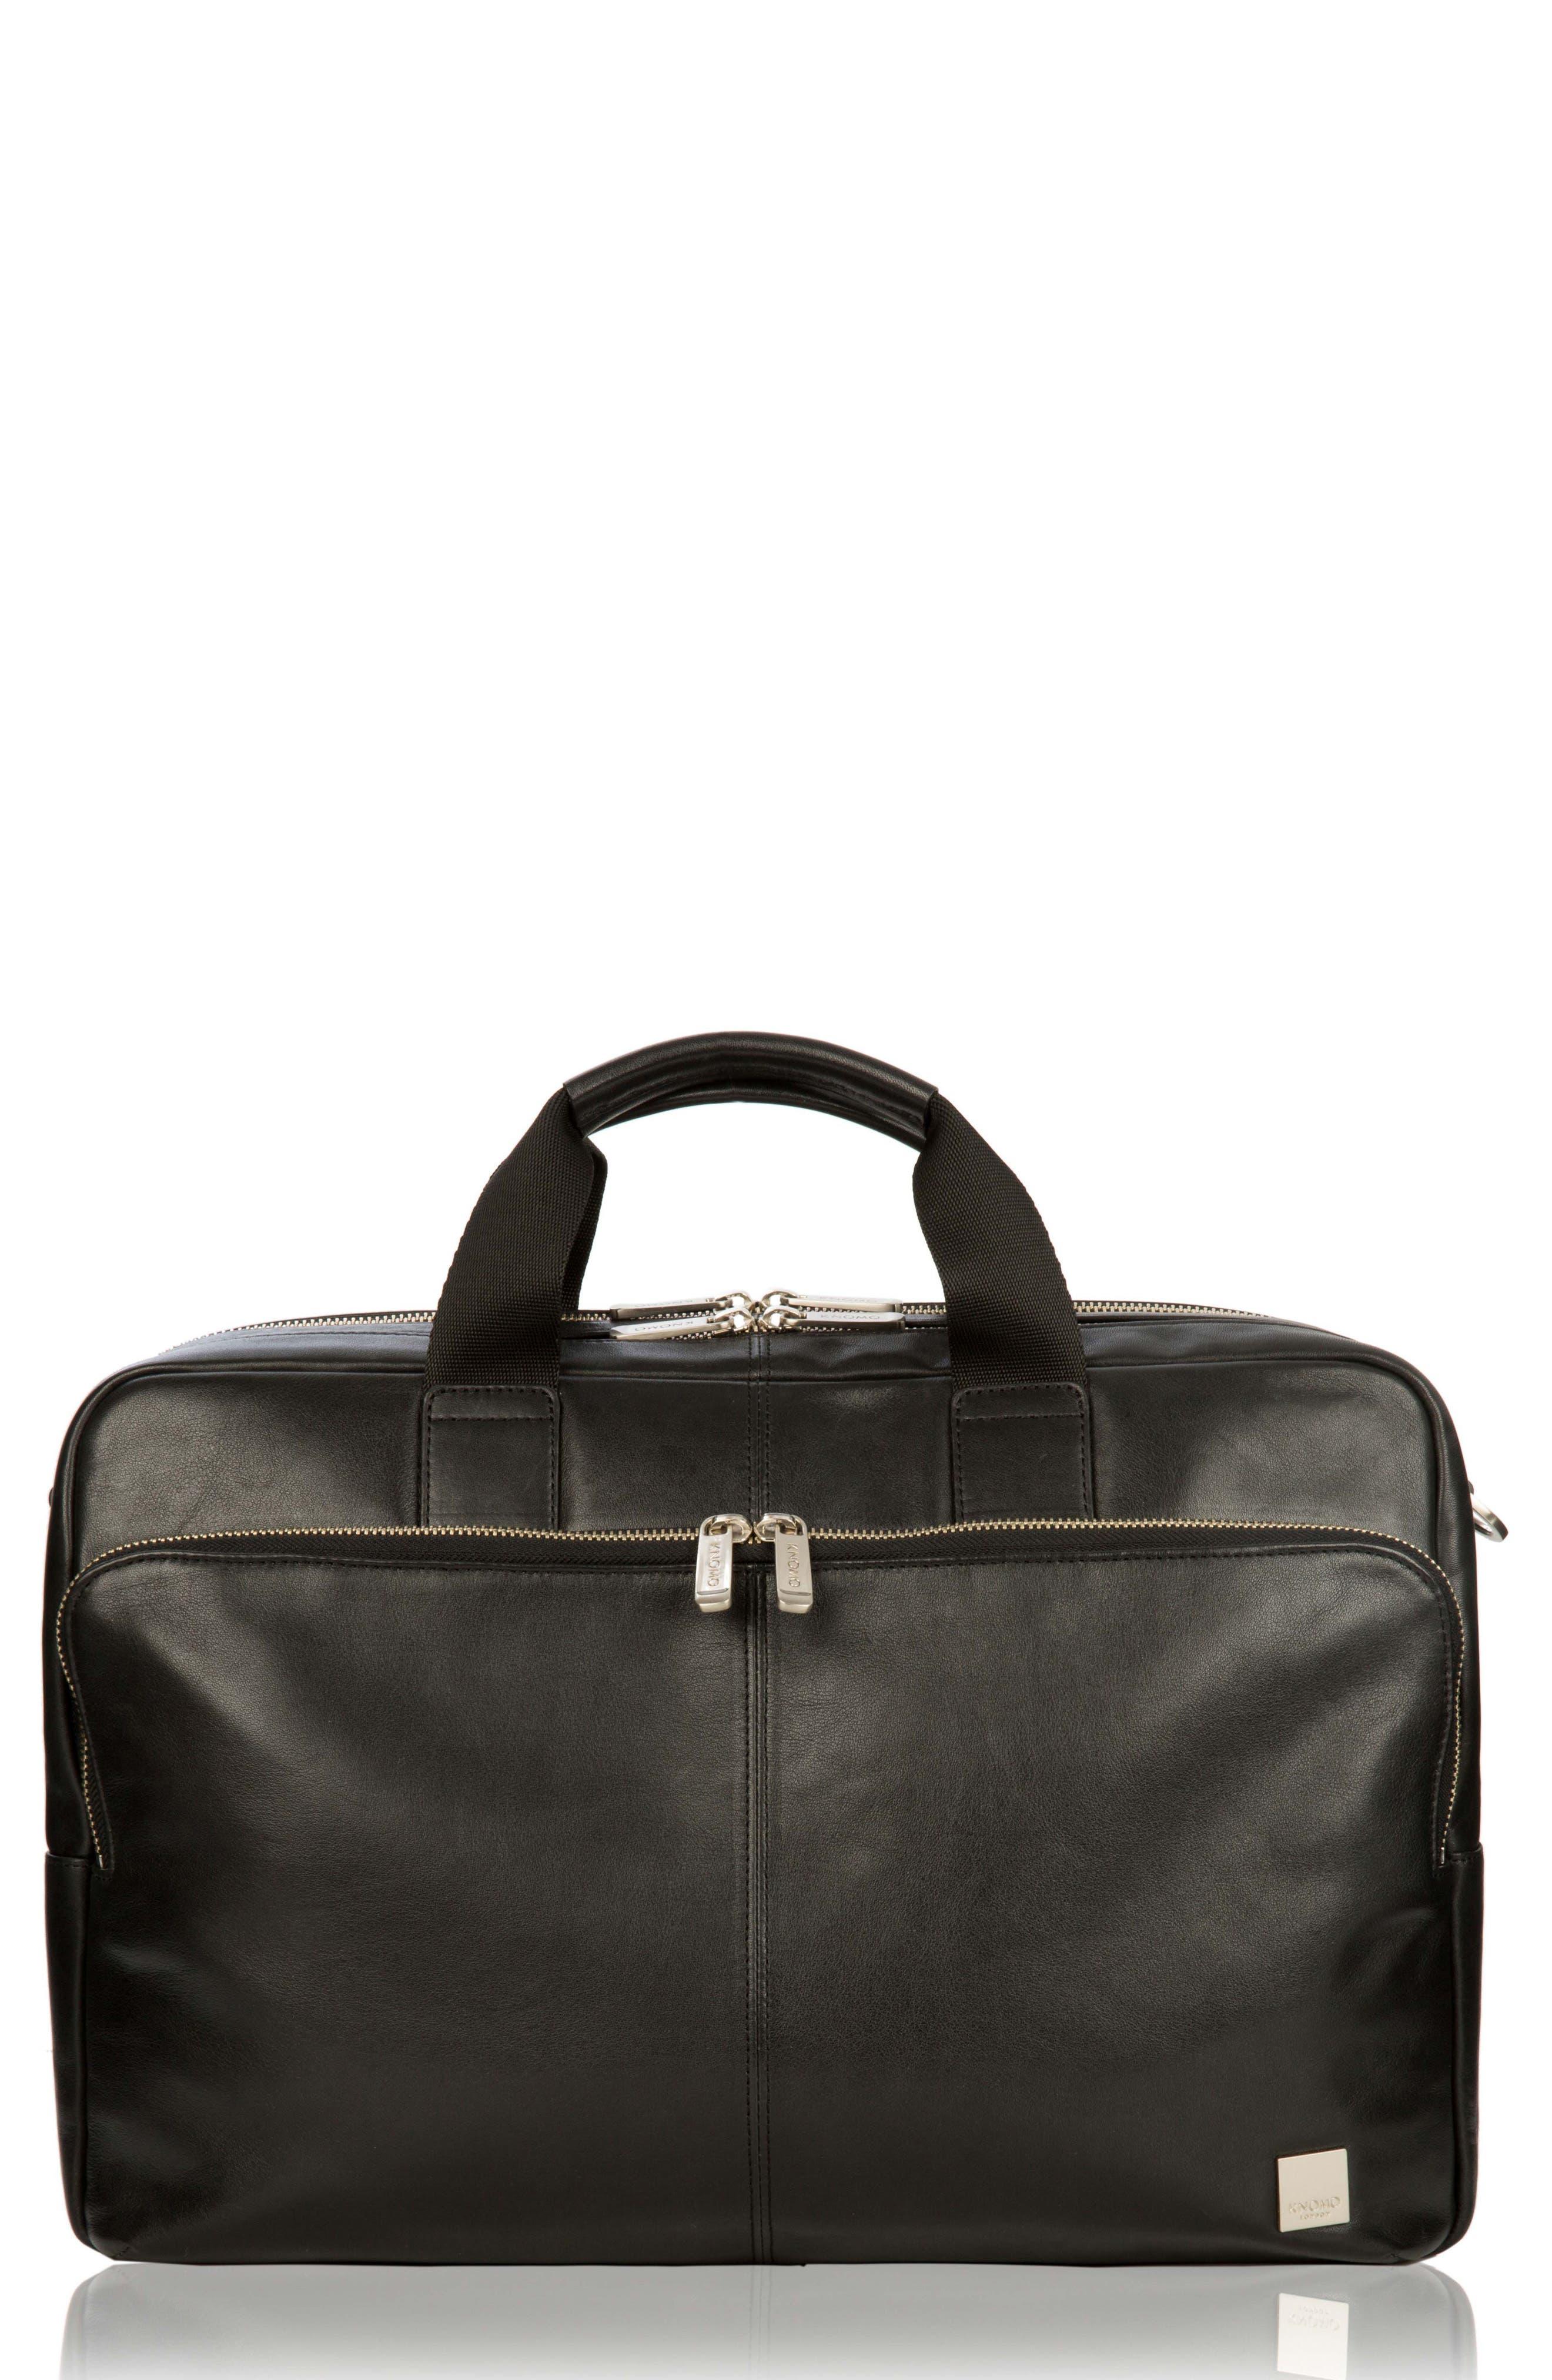 KNOMO LONDON Brompton Amesbury Leather Briefcase, Main, color, 001